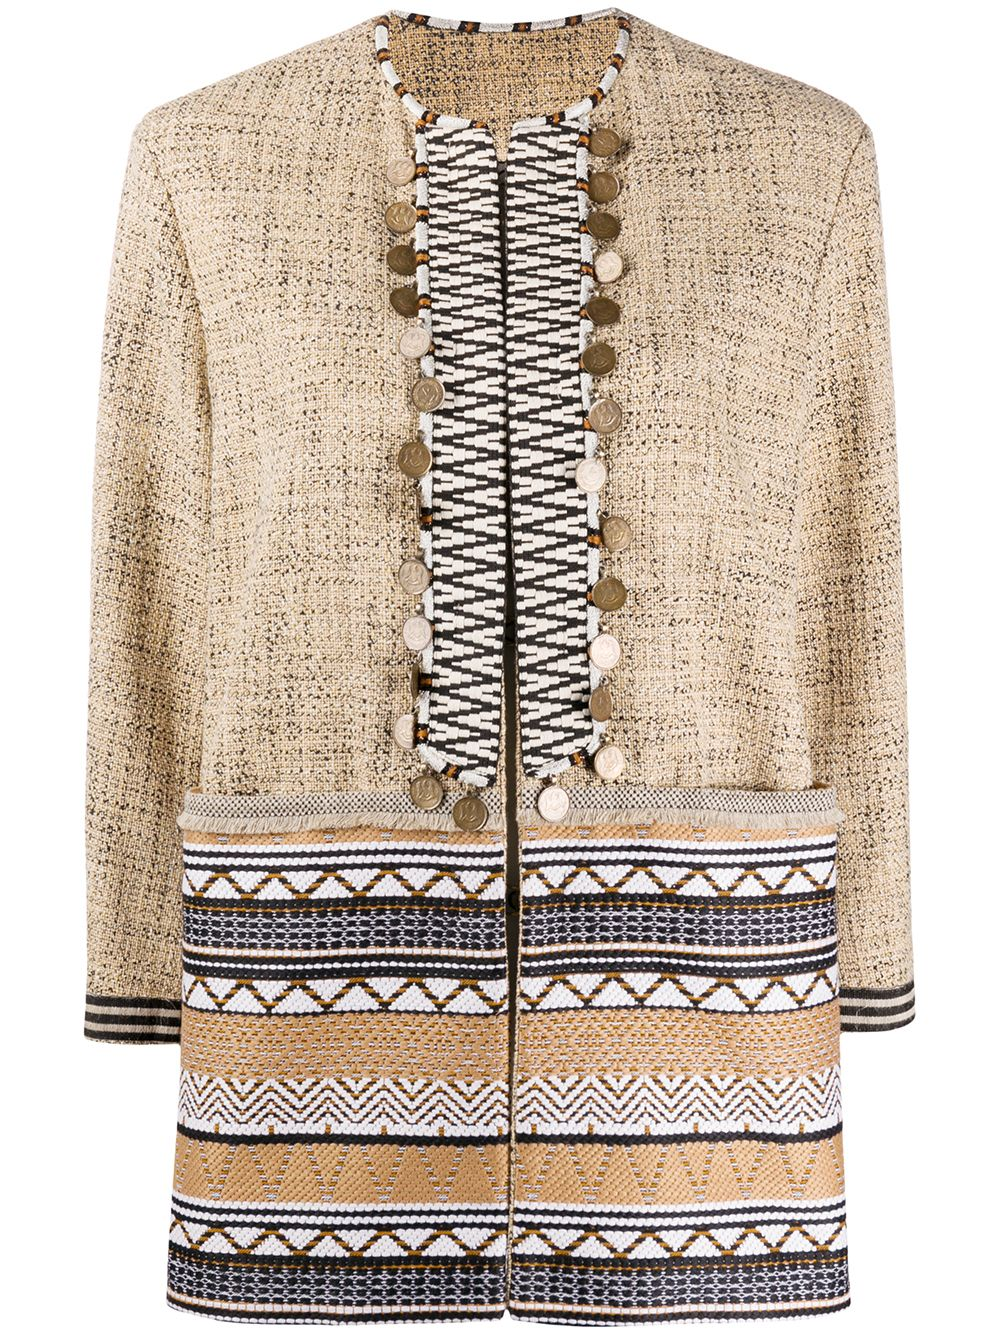 Cotton And Silk Geometric Jacquard Embellished Jacket